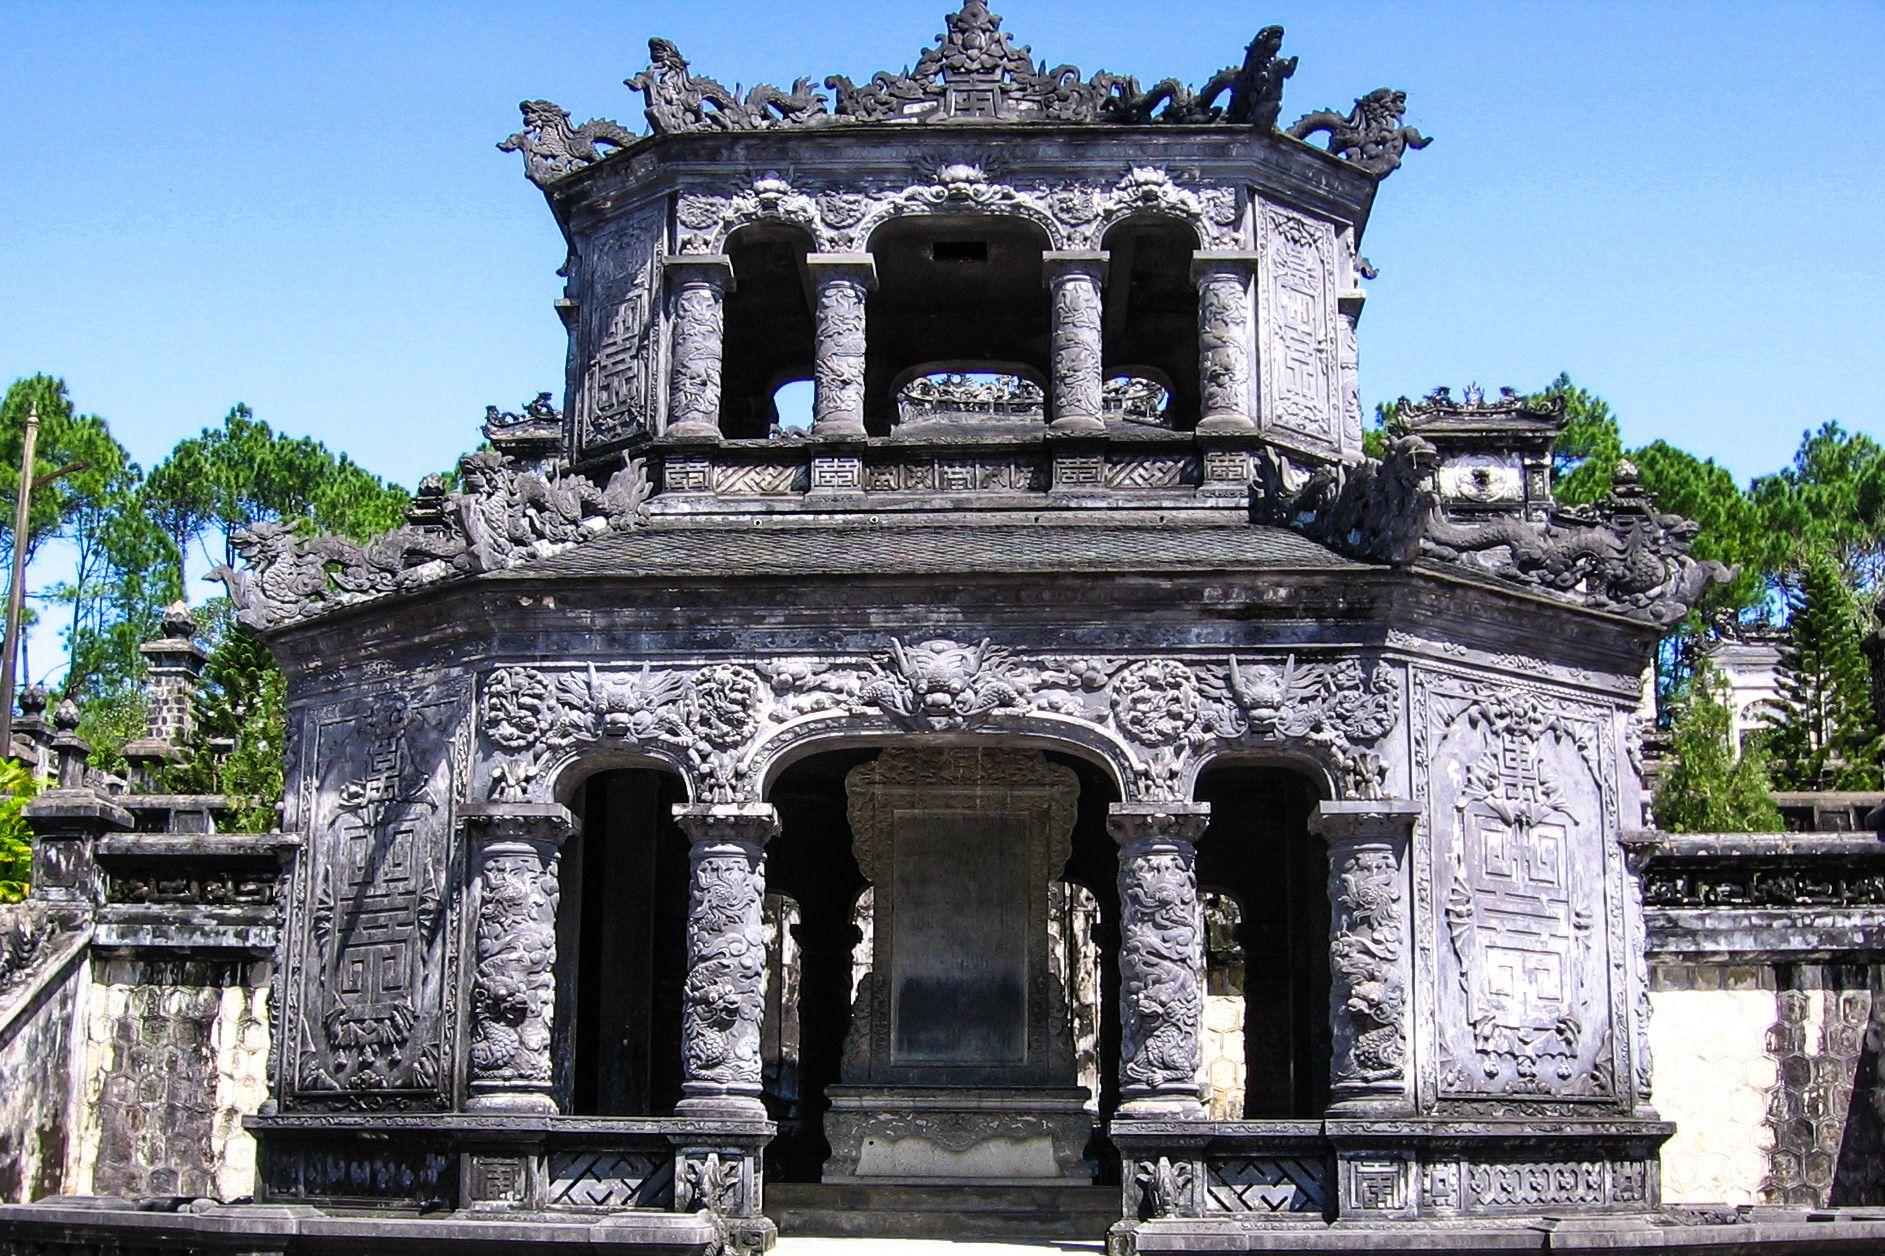 Stele Pavilion, forecourt, Khai Dinh Royal Tomb, Hue, Vietnam.